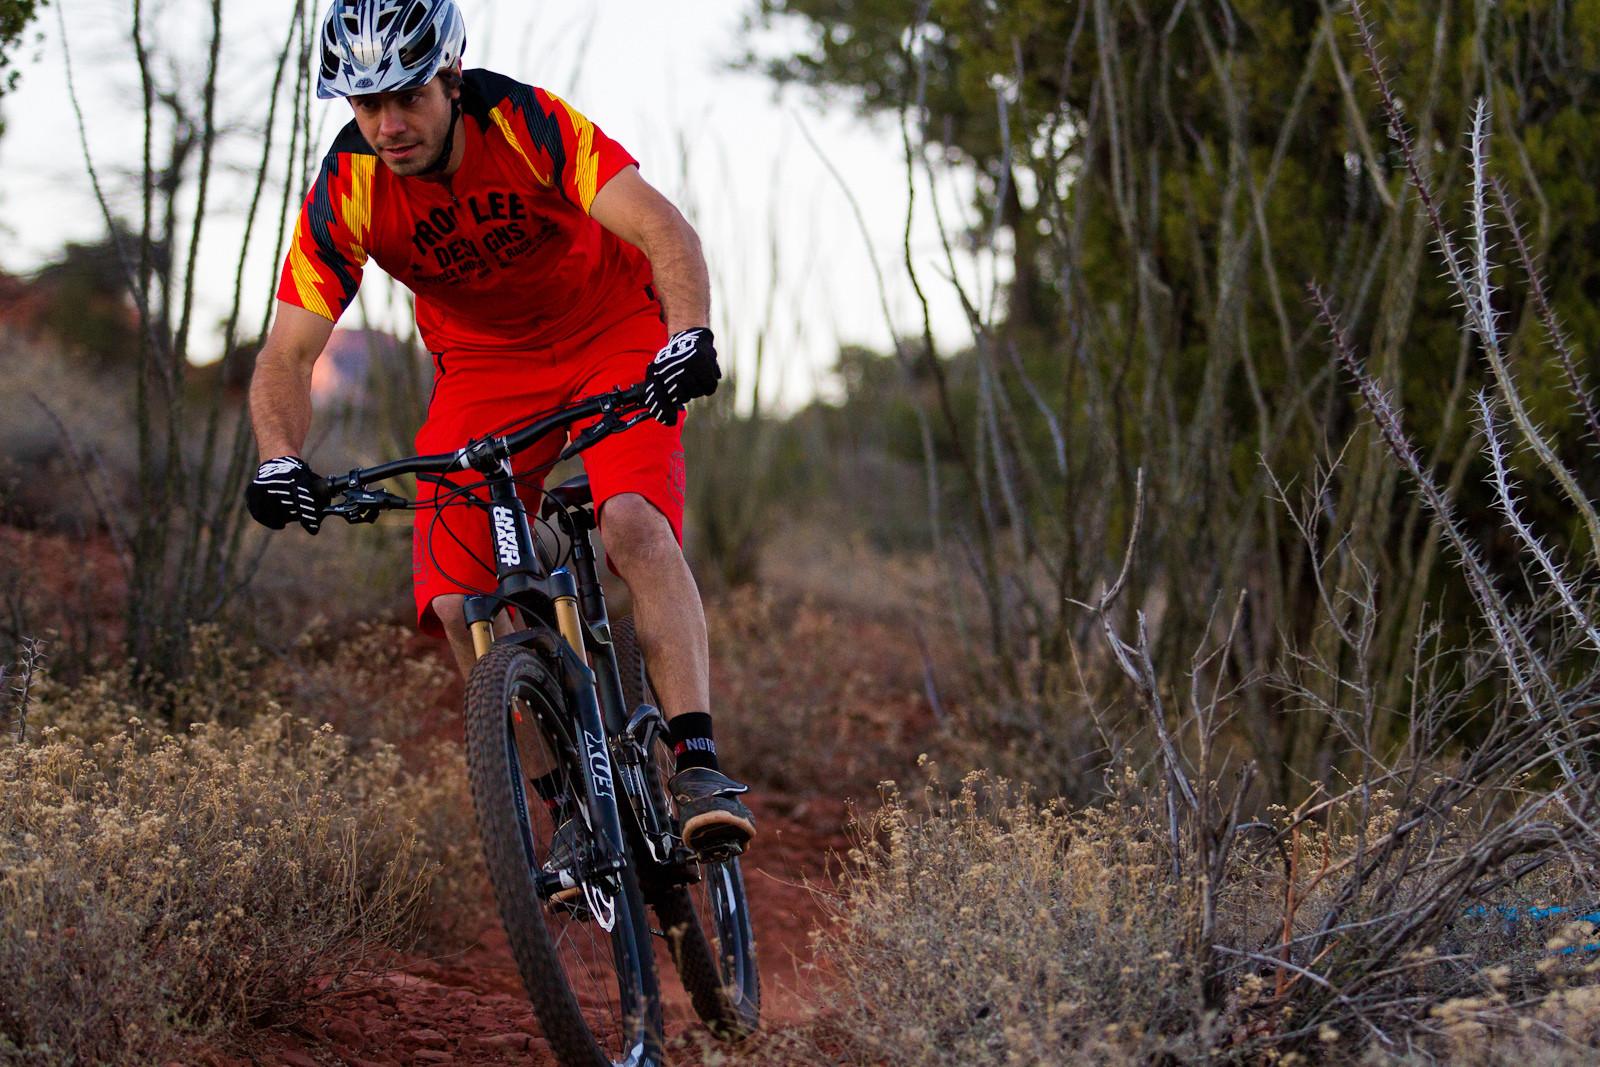 Giant Trance Advanced SX 27.5 - 2014 Test Sessions: Giant Trance Advanced SX 27.5 - Mountain Biking Pictures - Vital MTB